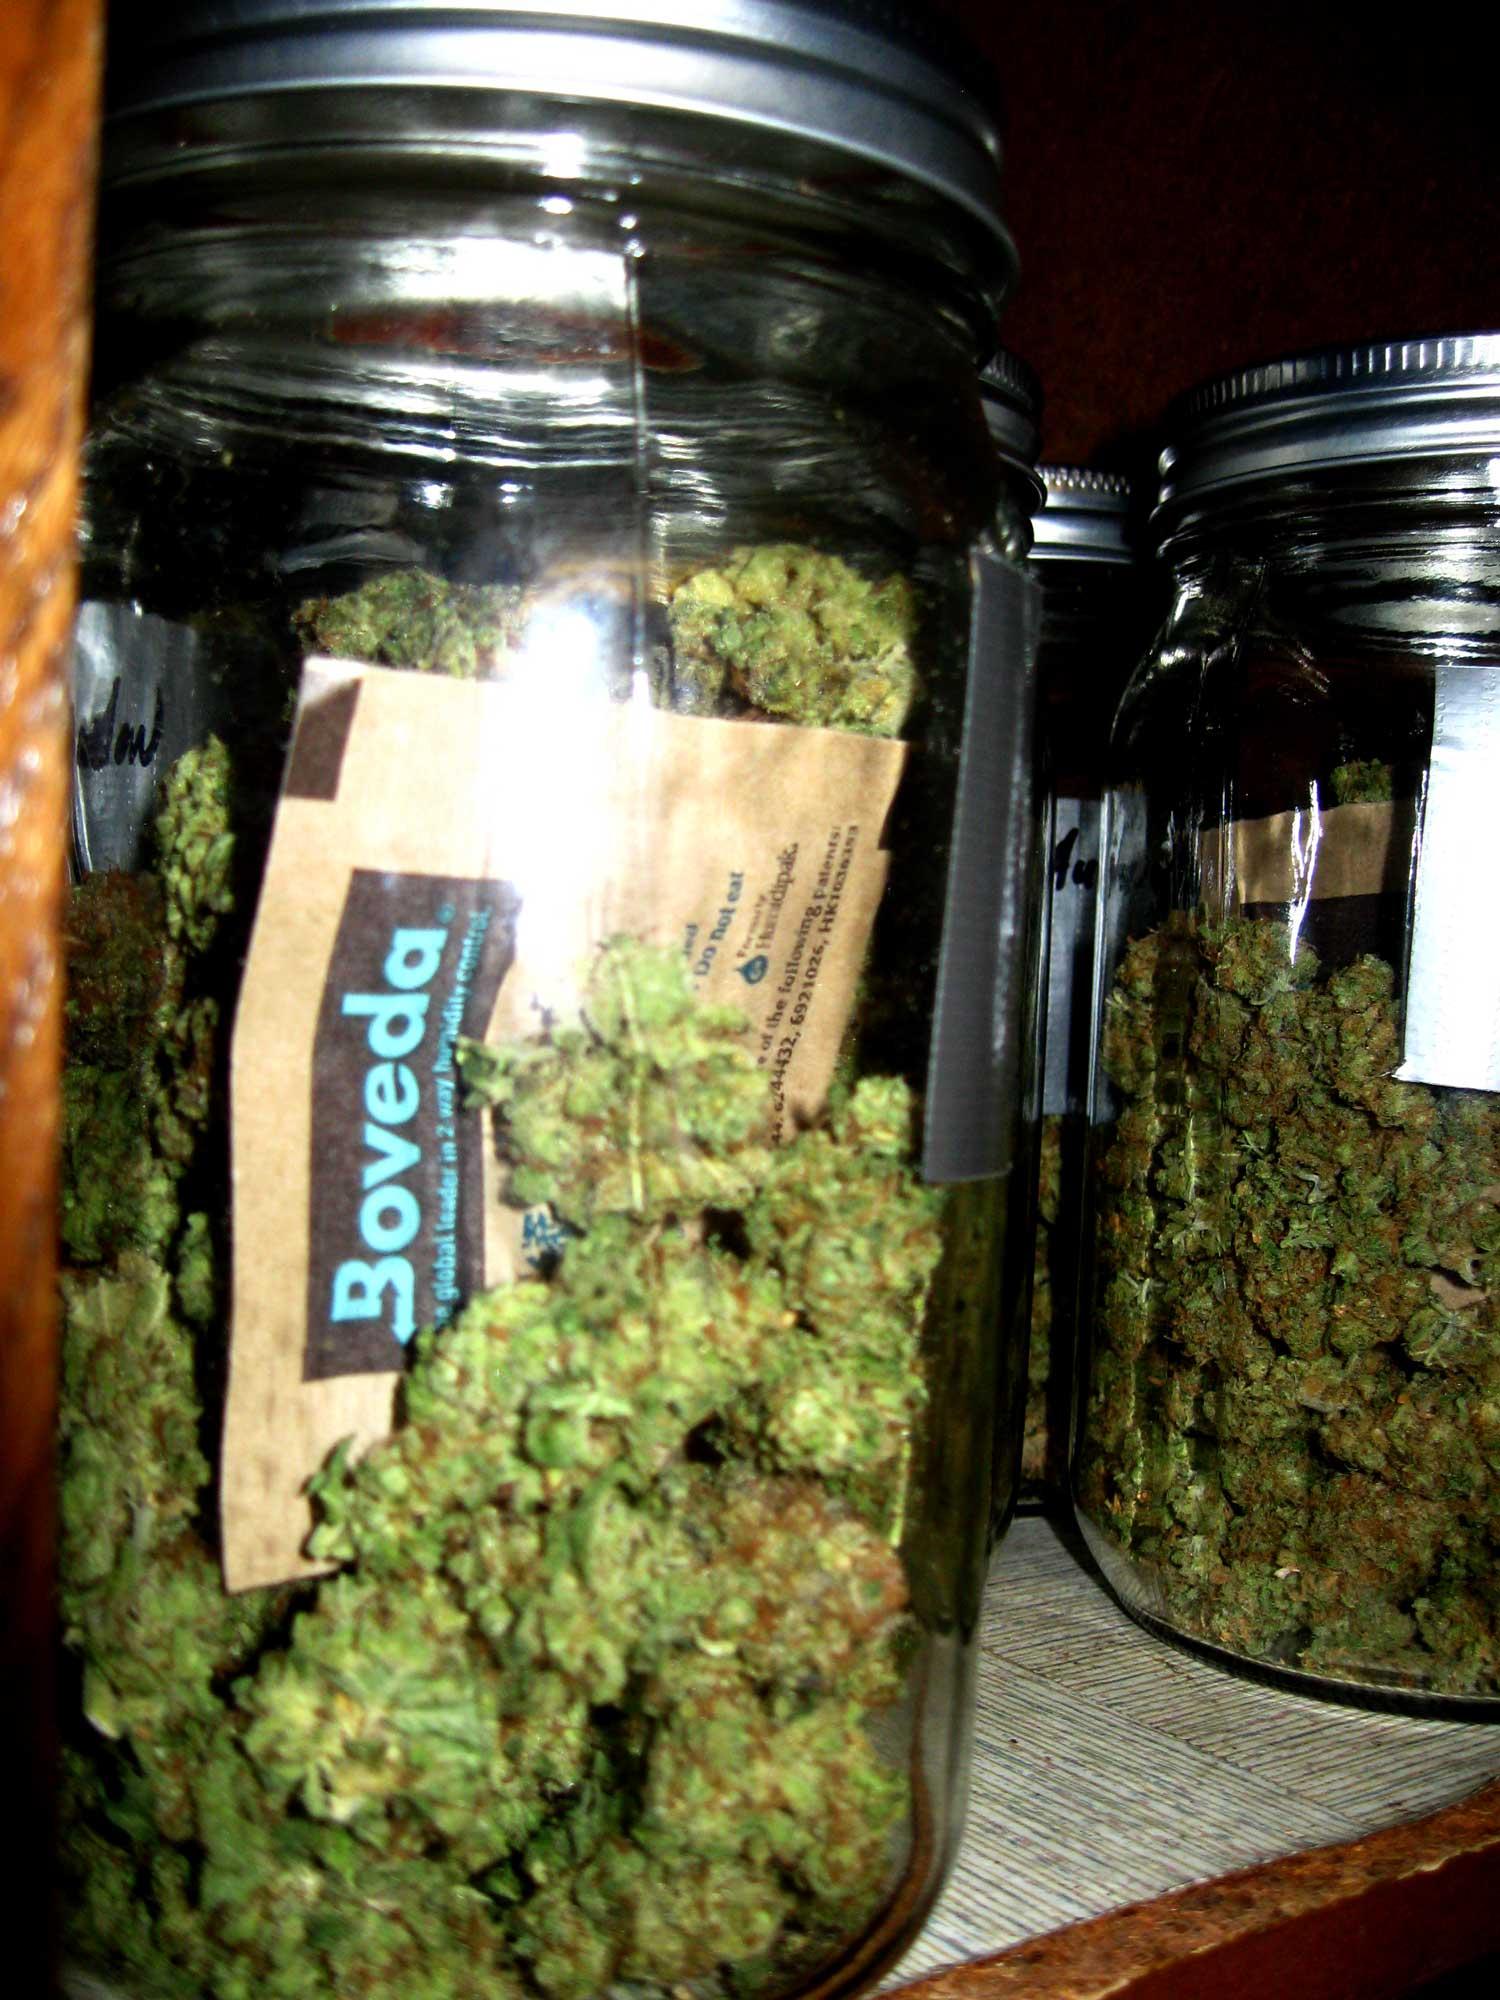 How To Dry Amp Cure Marijuana Step By Step Tutorial Grow